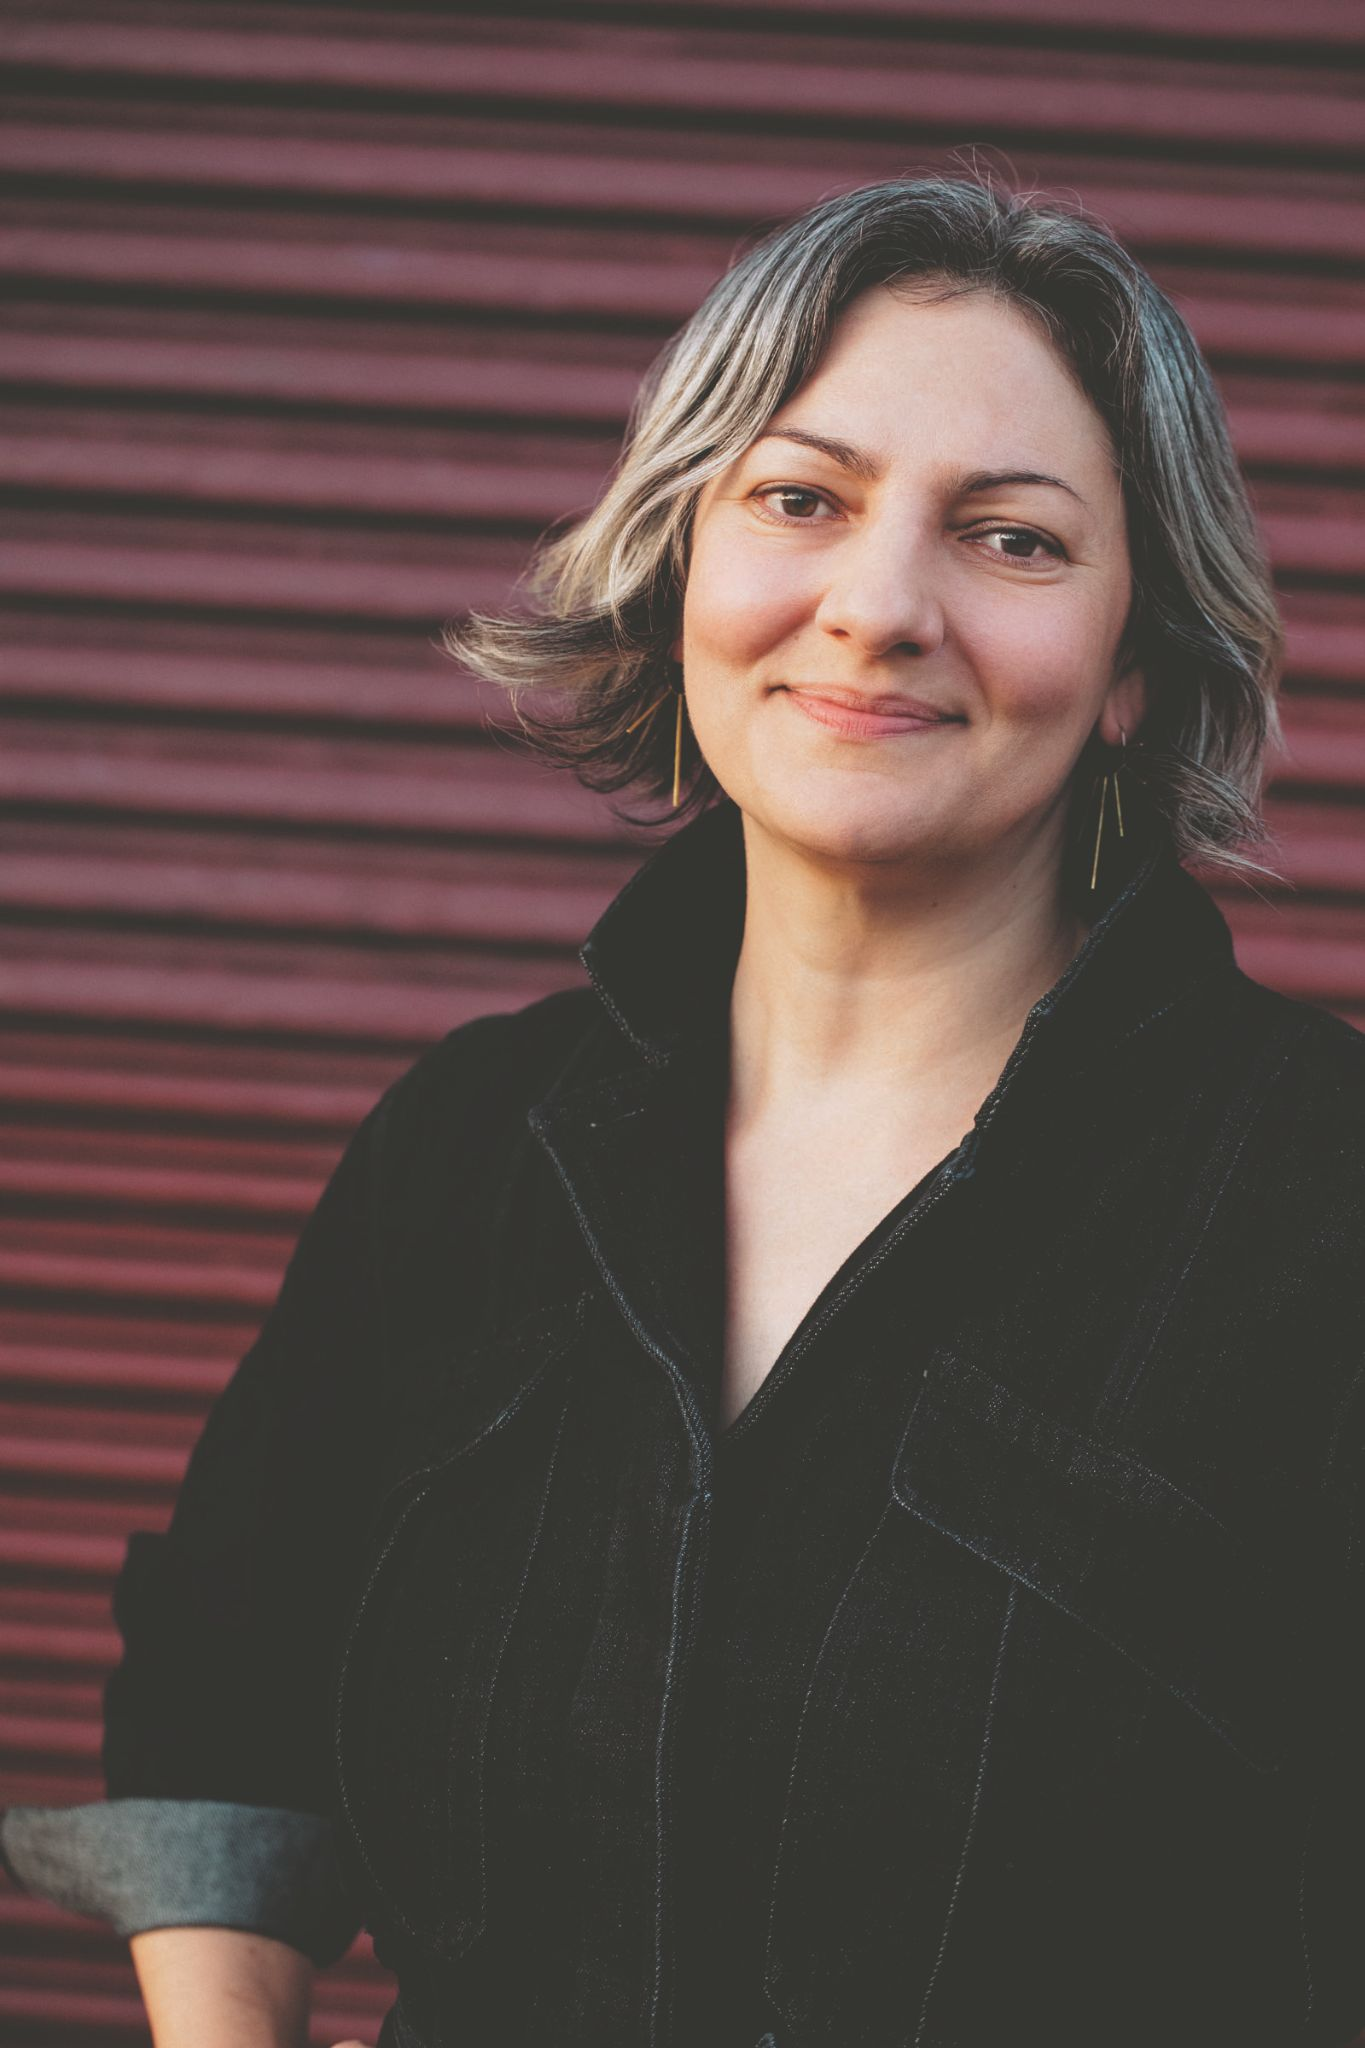 A headshot of Sarah Stein Greenberg.